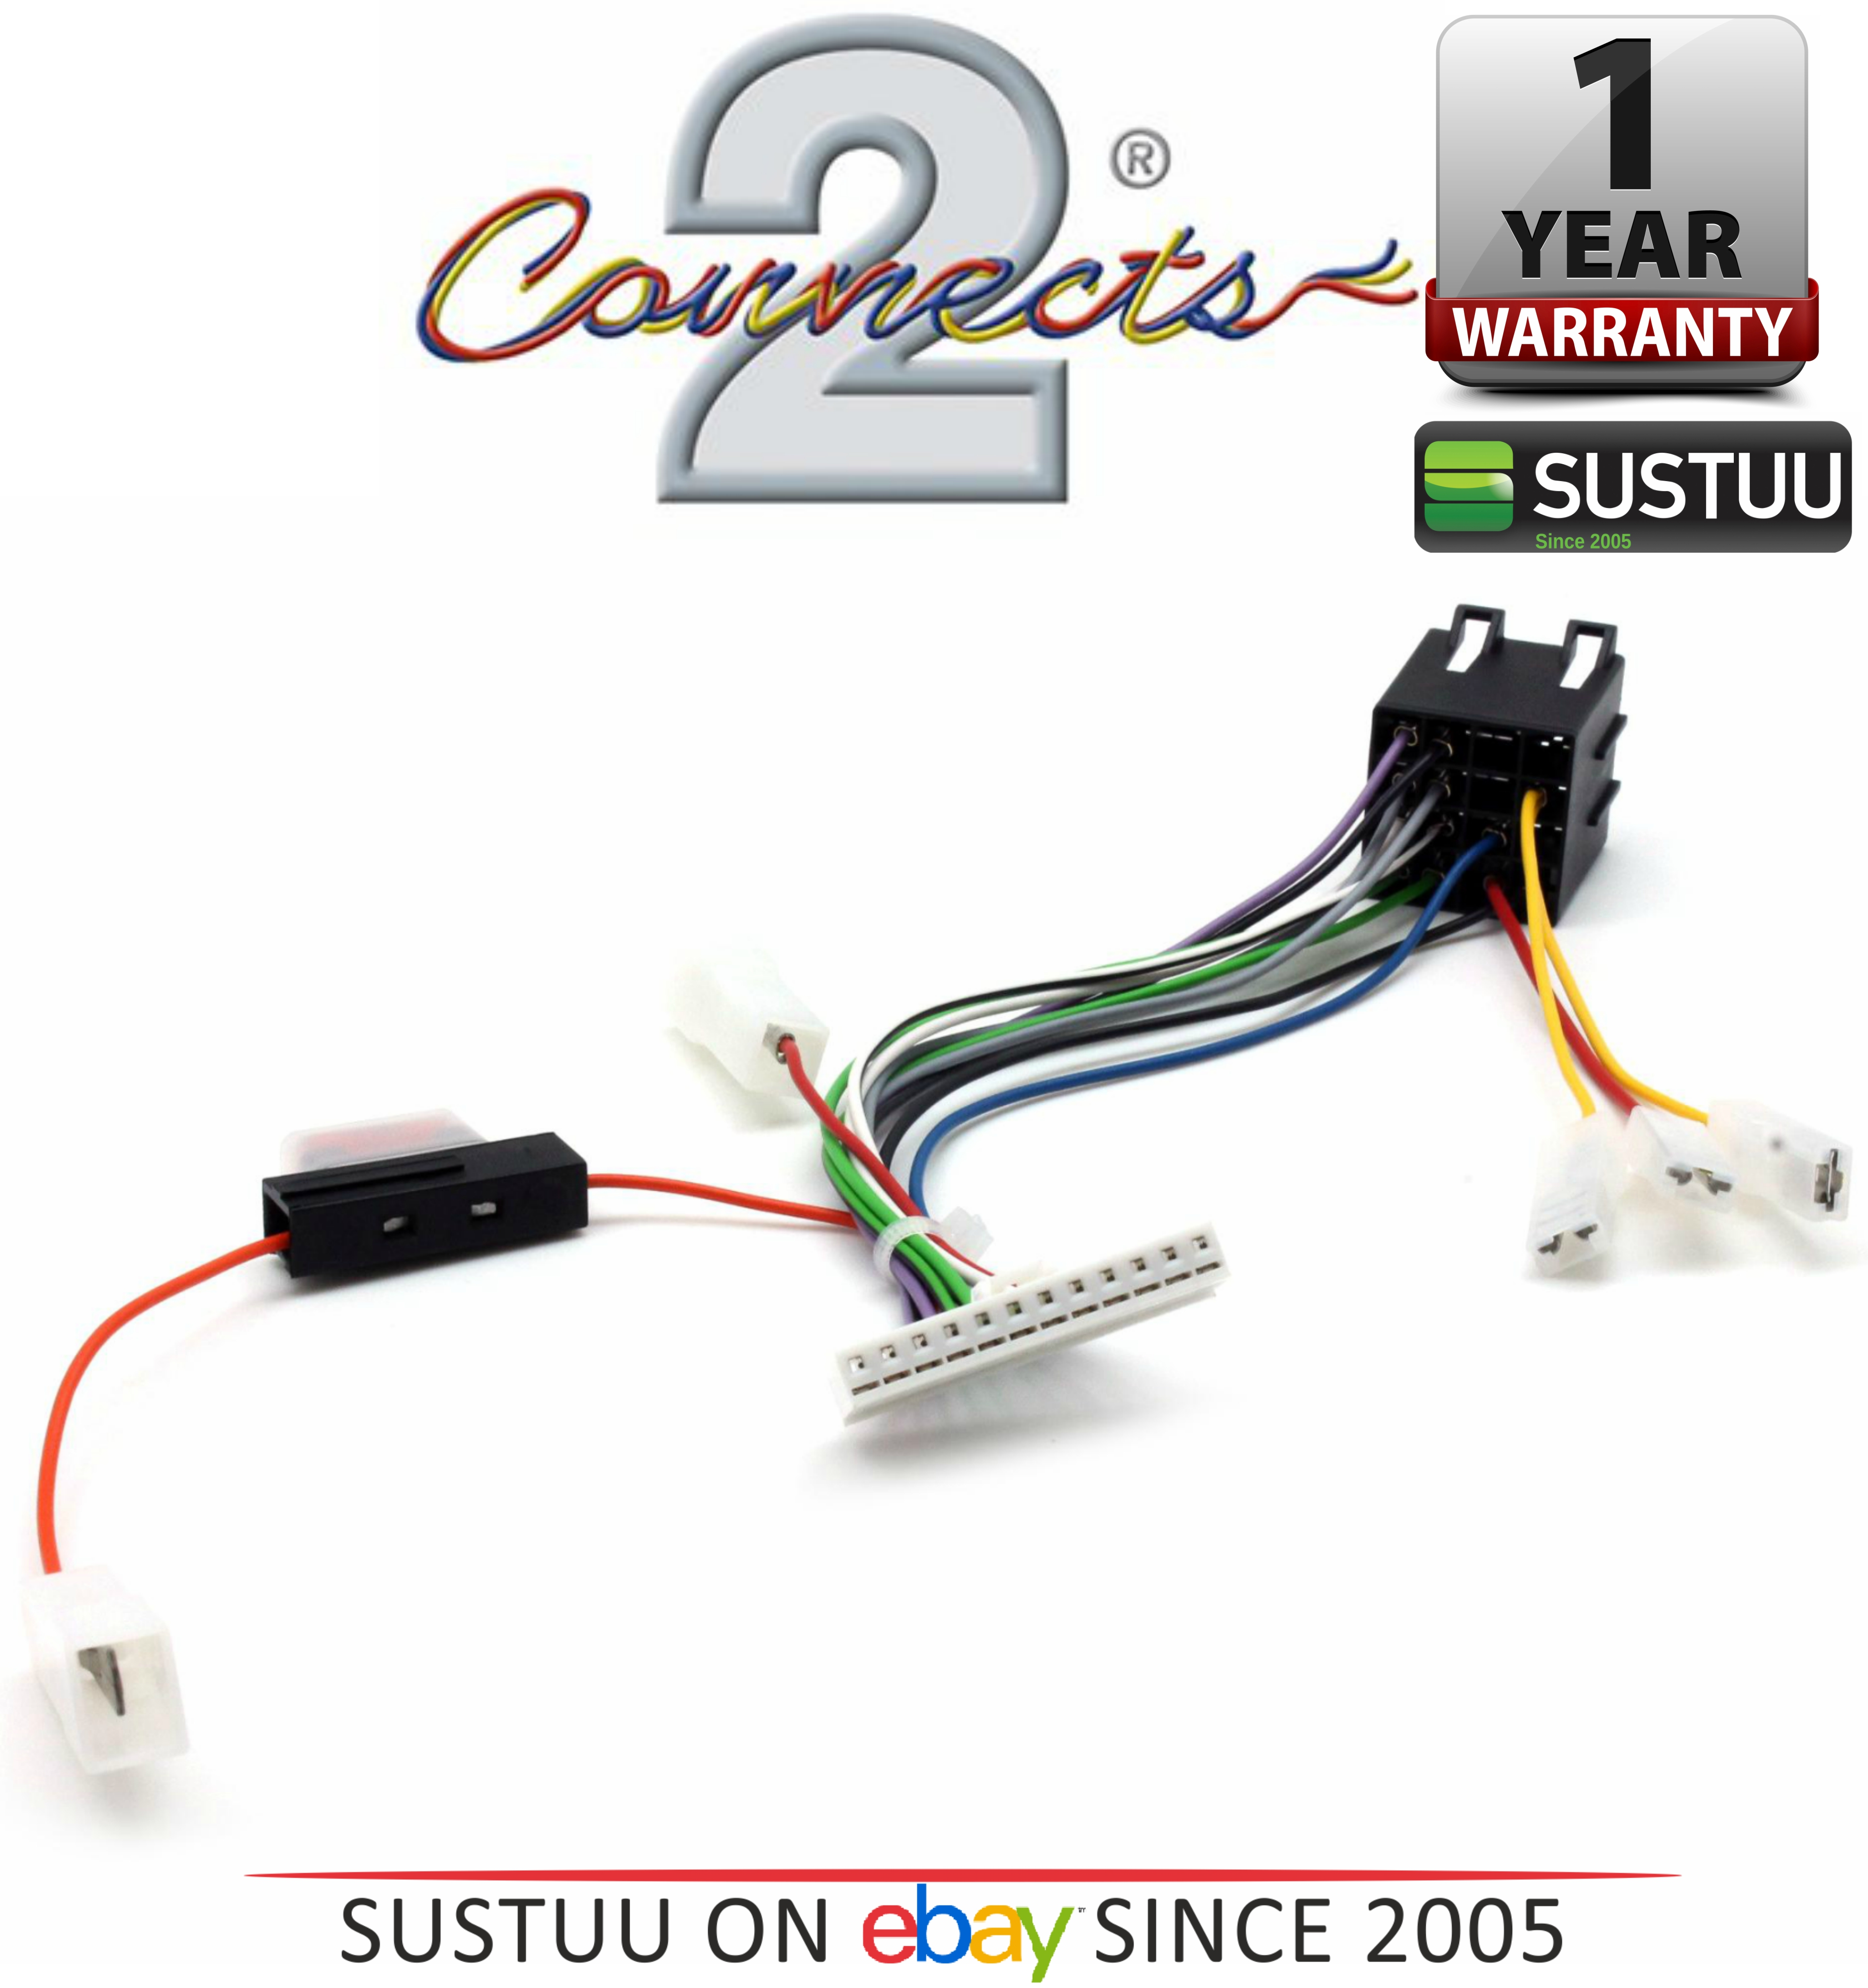 bt 50 radio wiring diagram evinrude 115 pioneer mvh 290bt plugs